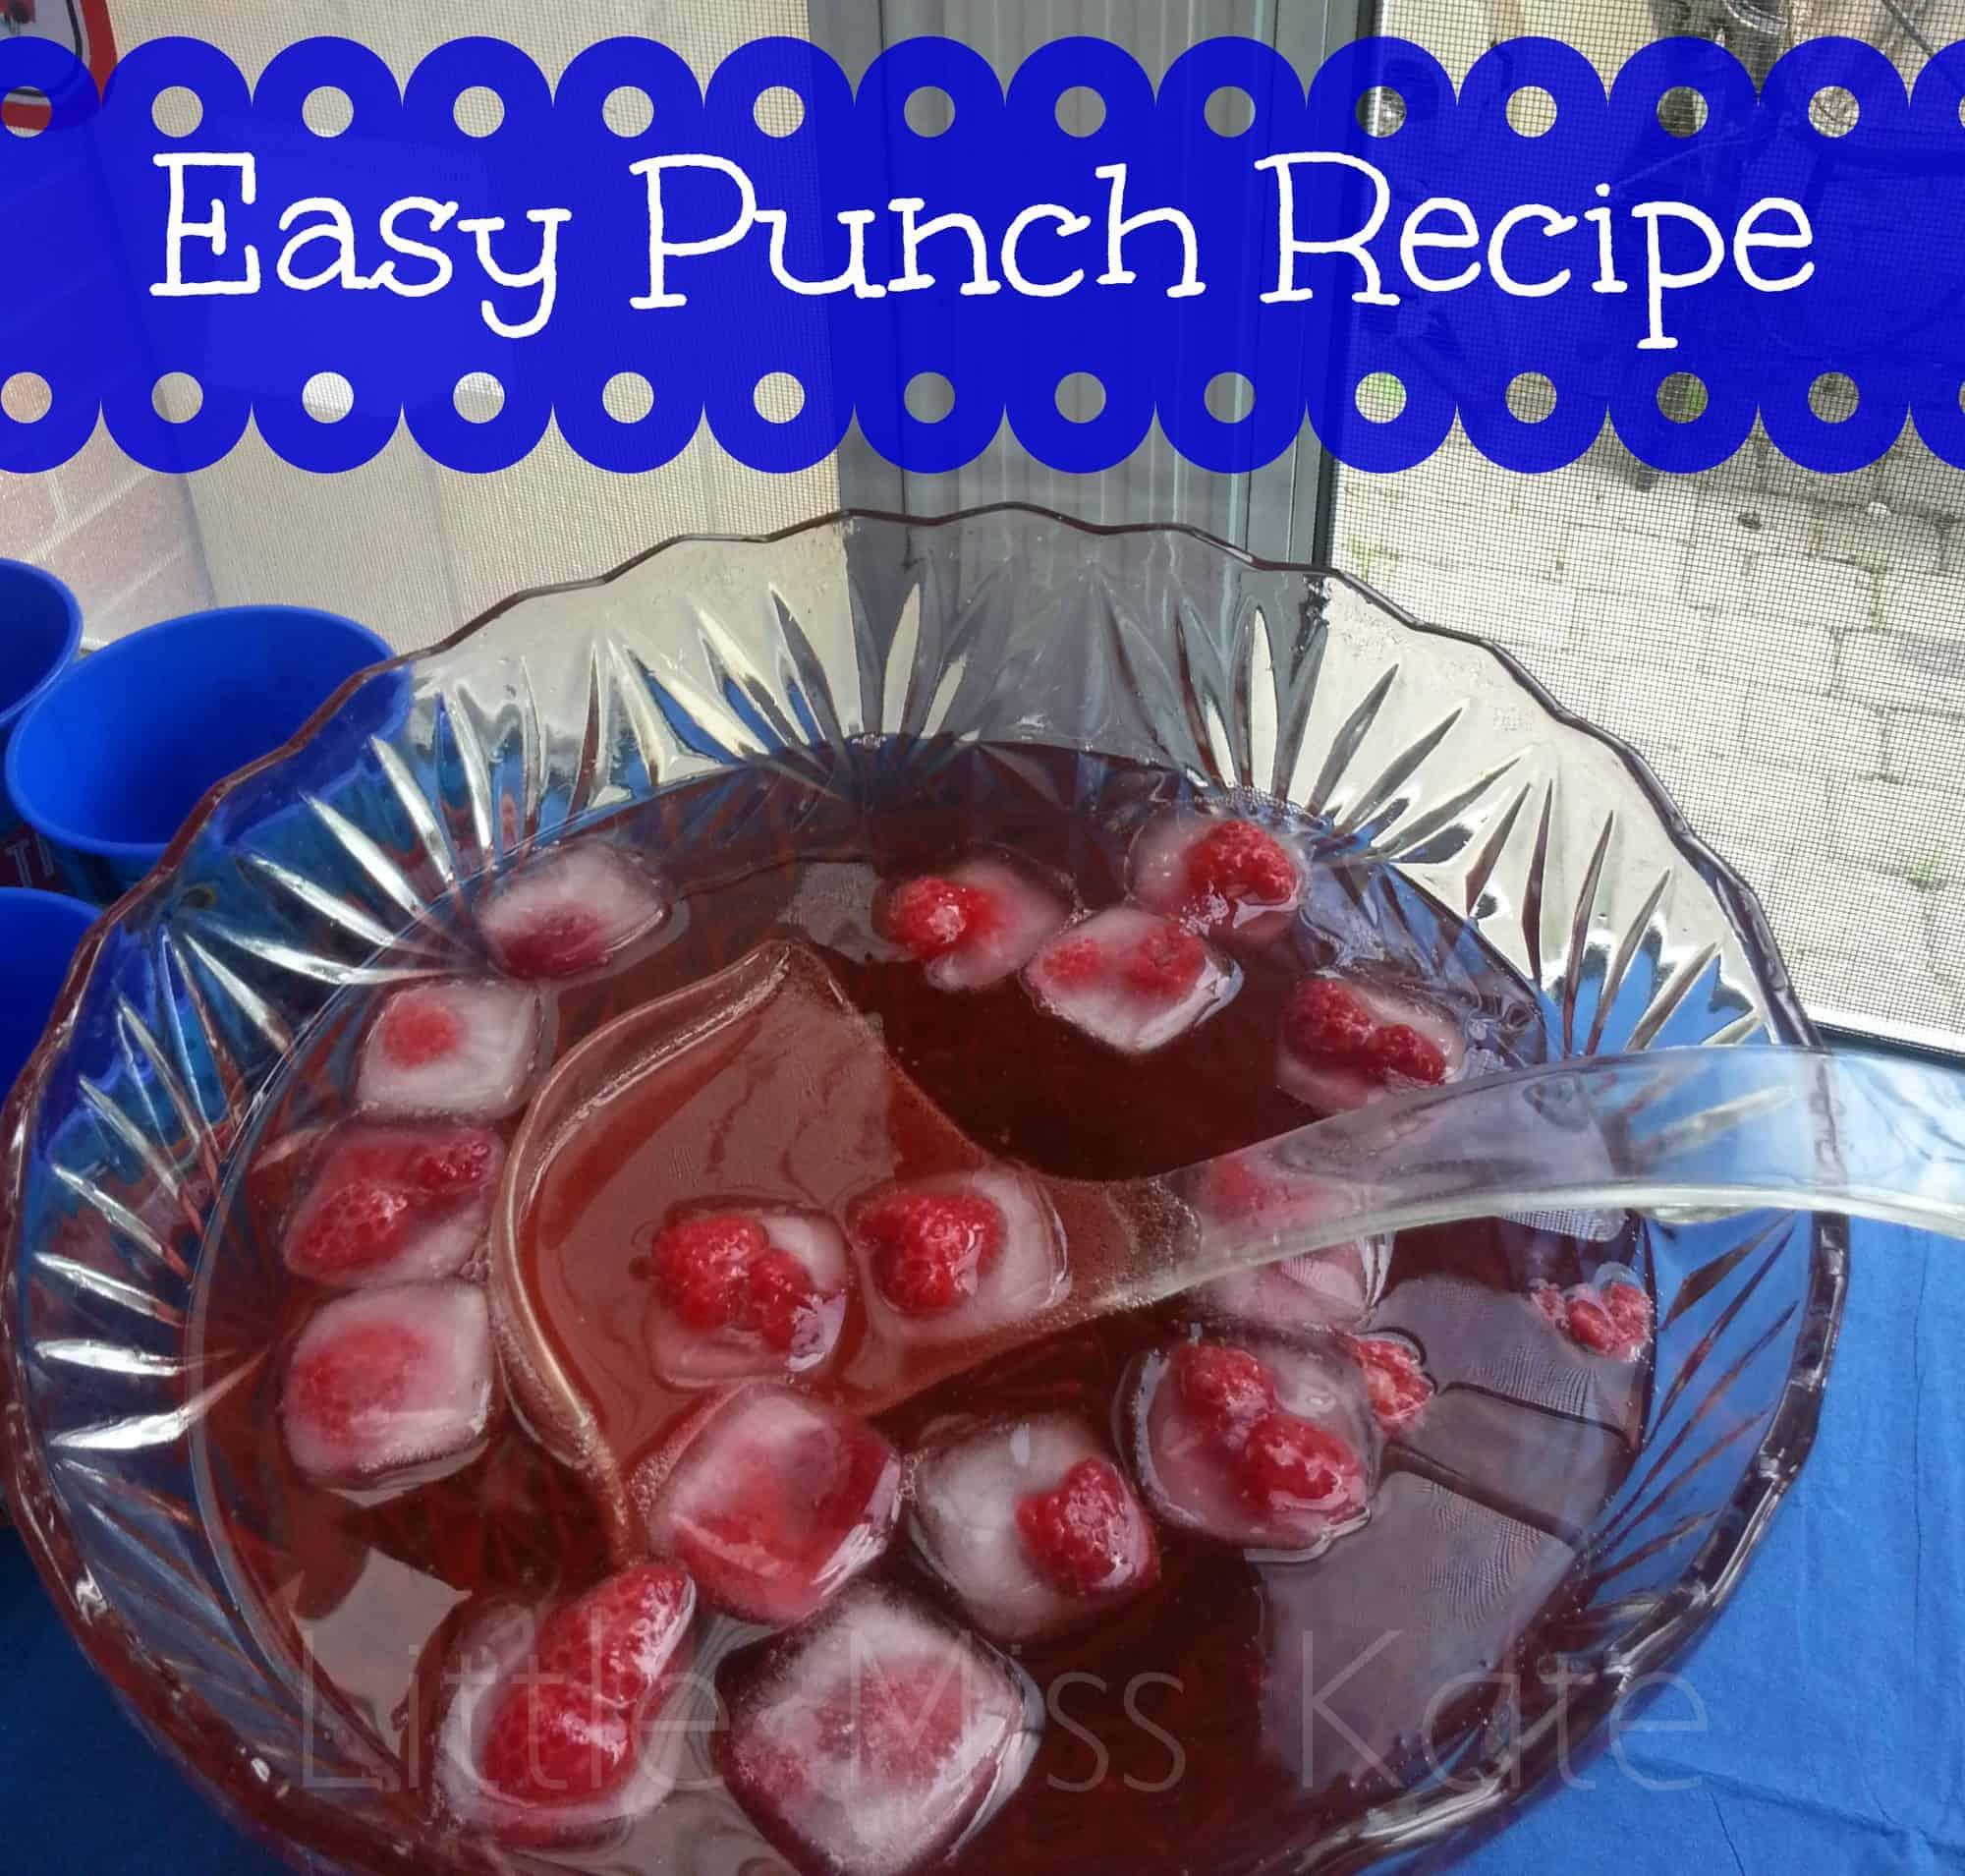 Easy Punch Recipe